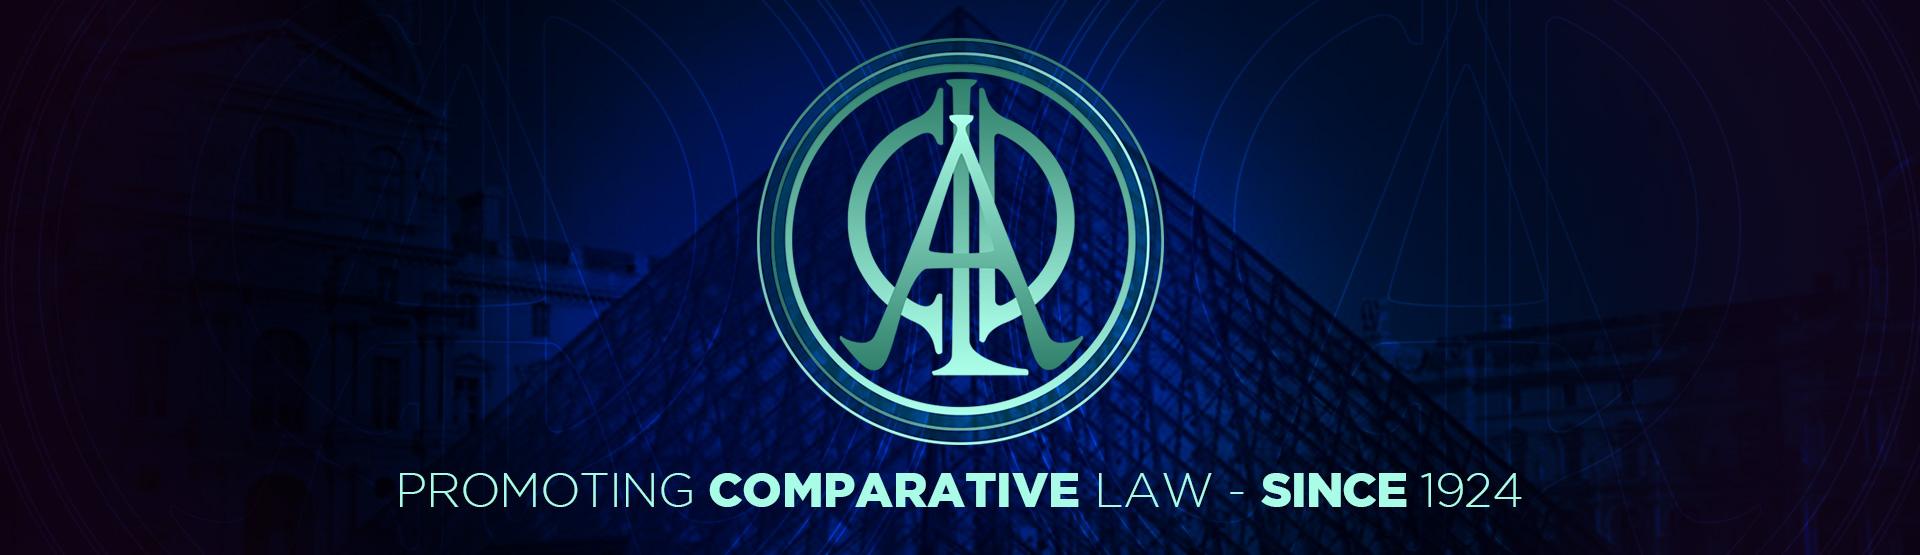 General Presentation | AIDC - IACL